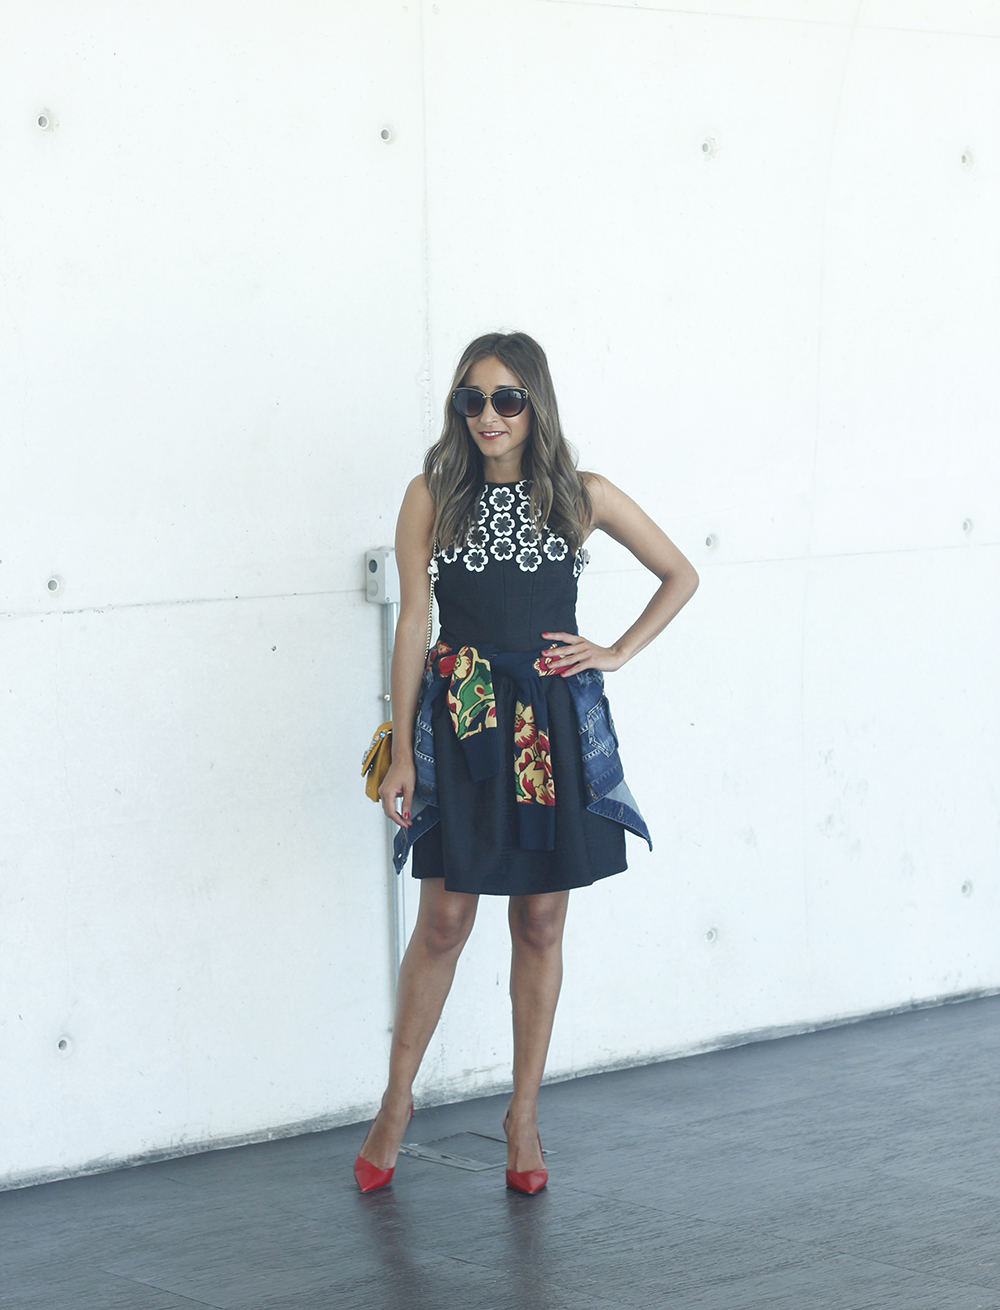 desigual black dress and denim jacket for fashion week madrid outfit fashion03